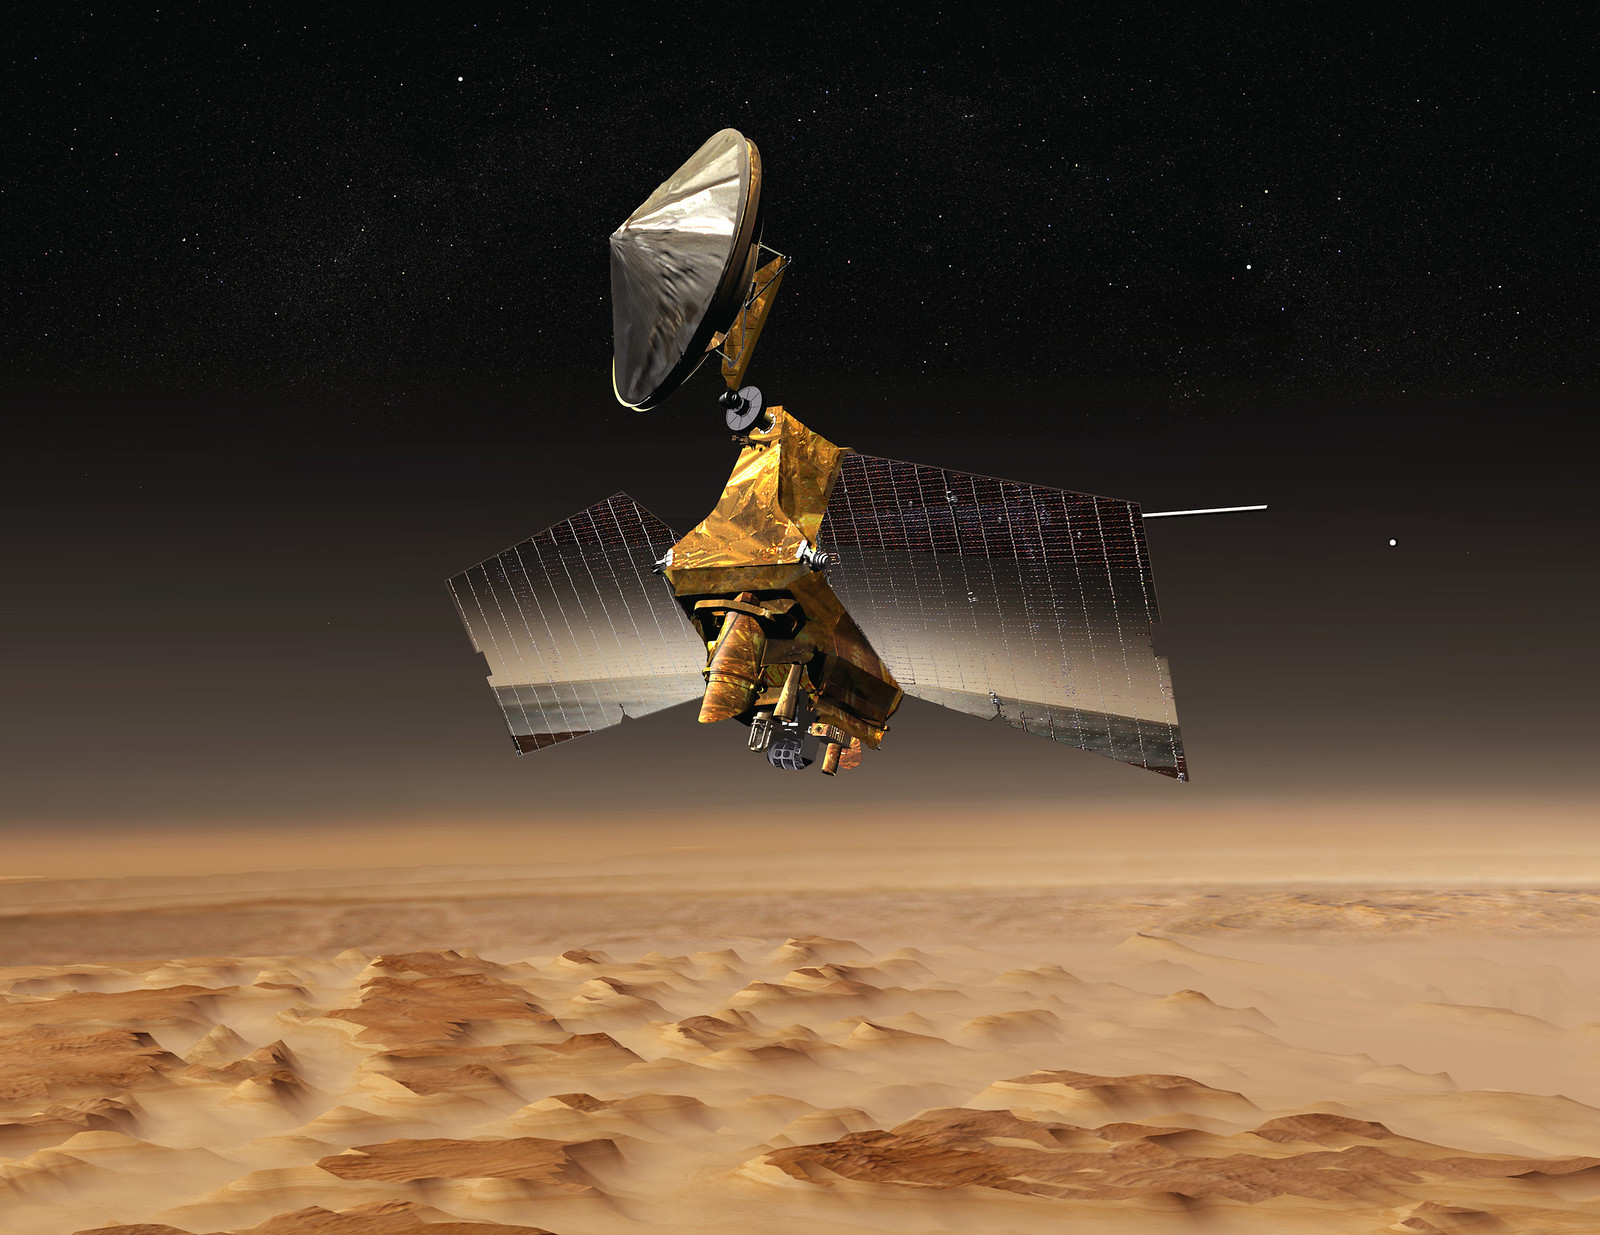 Mars Reconnaissance Orbiter PIA04916